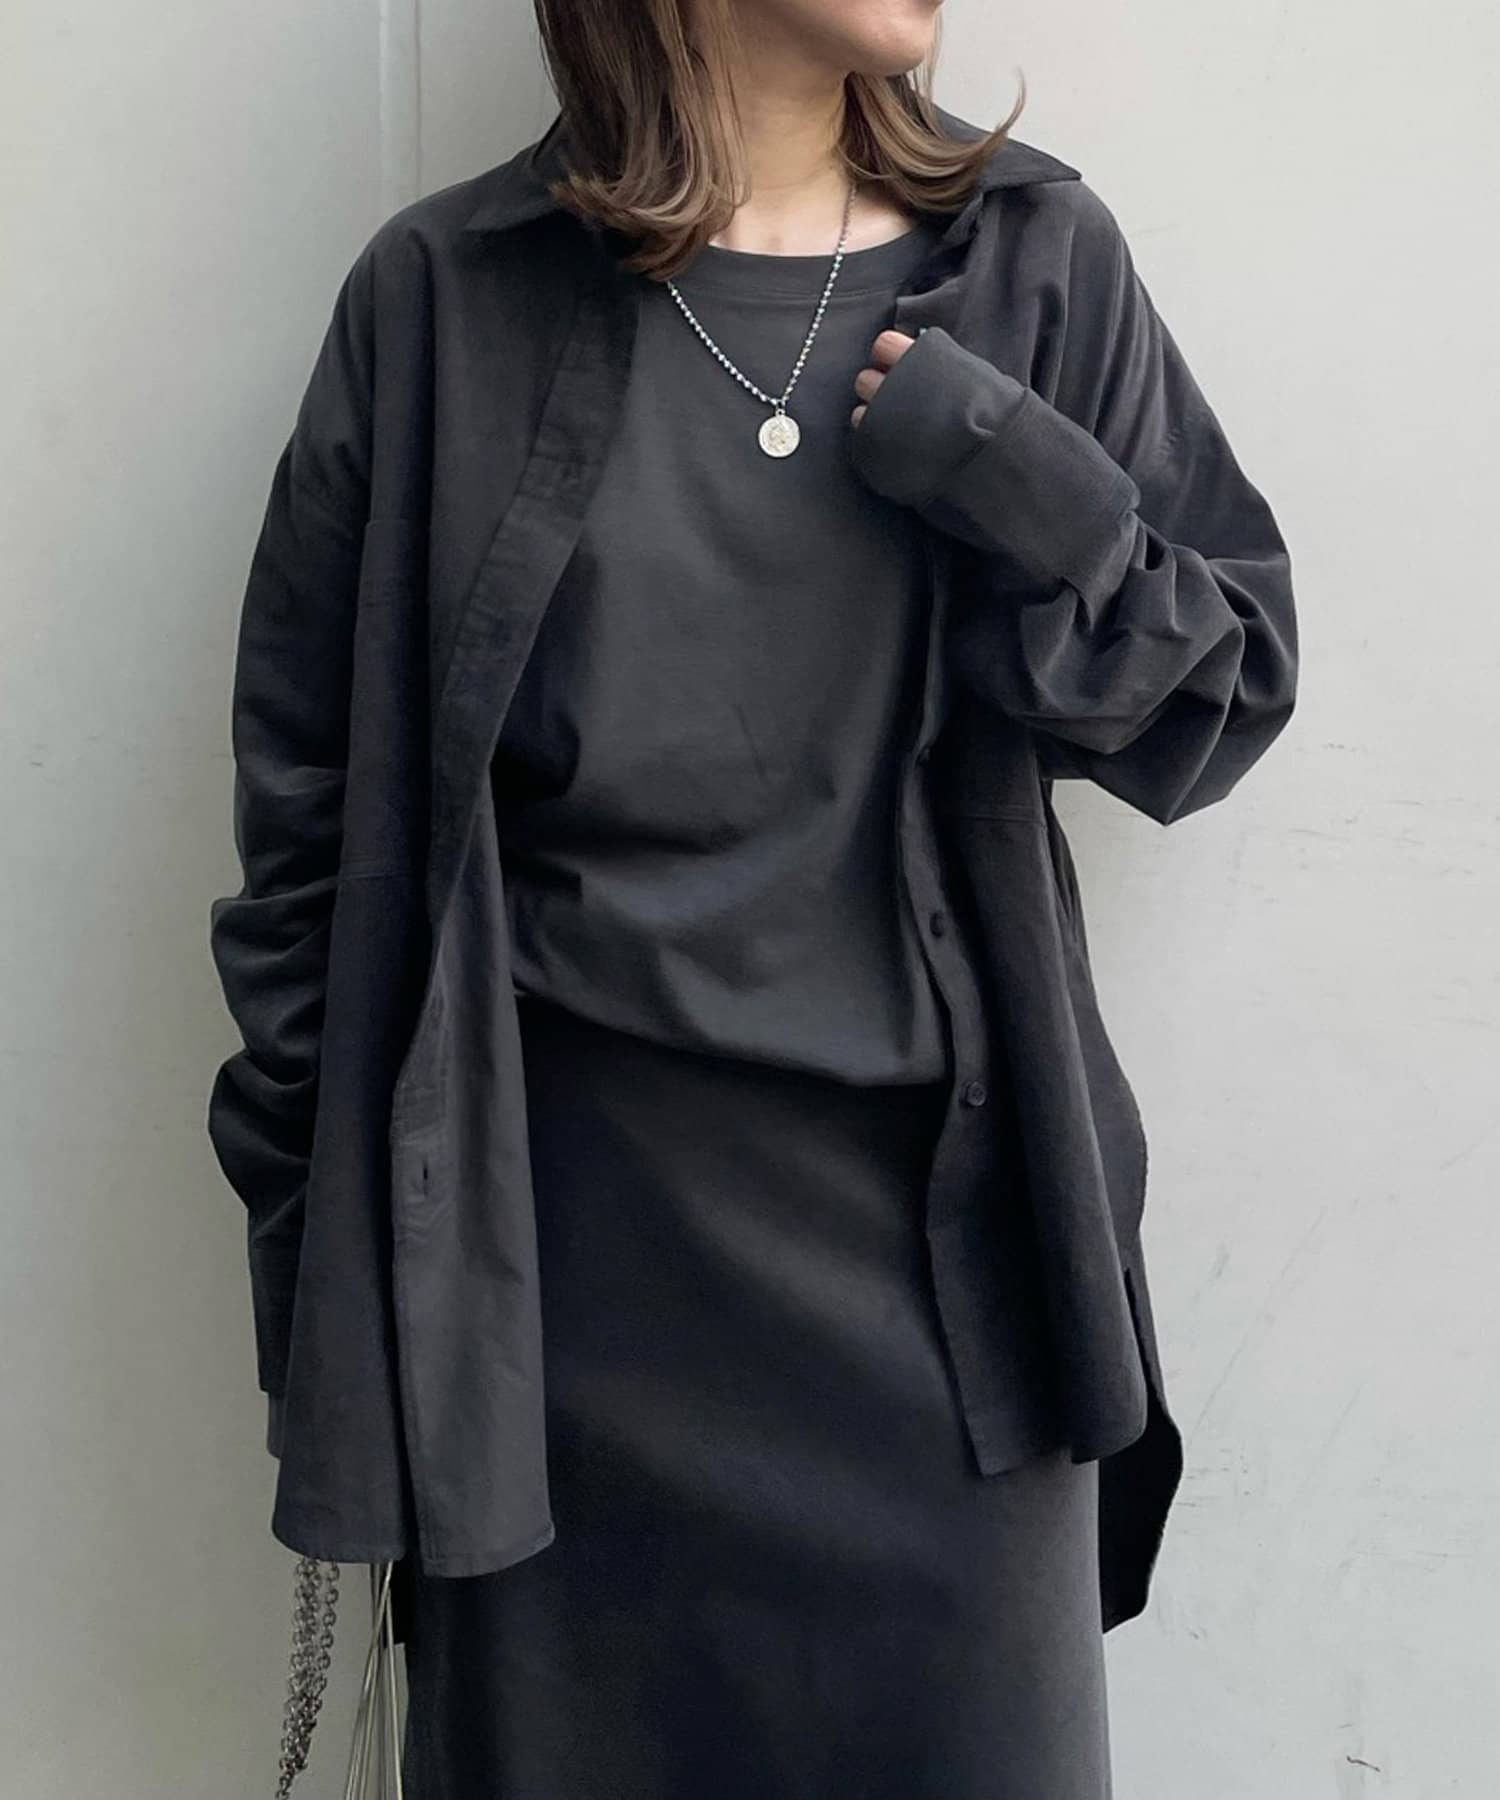 OUTLET(アウトレット) 【DouDou】セットアップコールテンシャツ